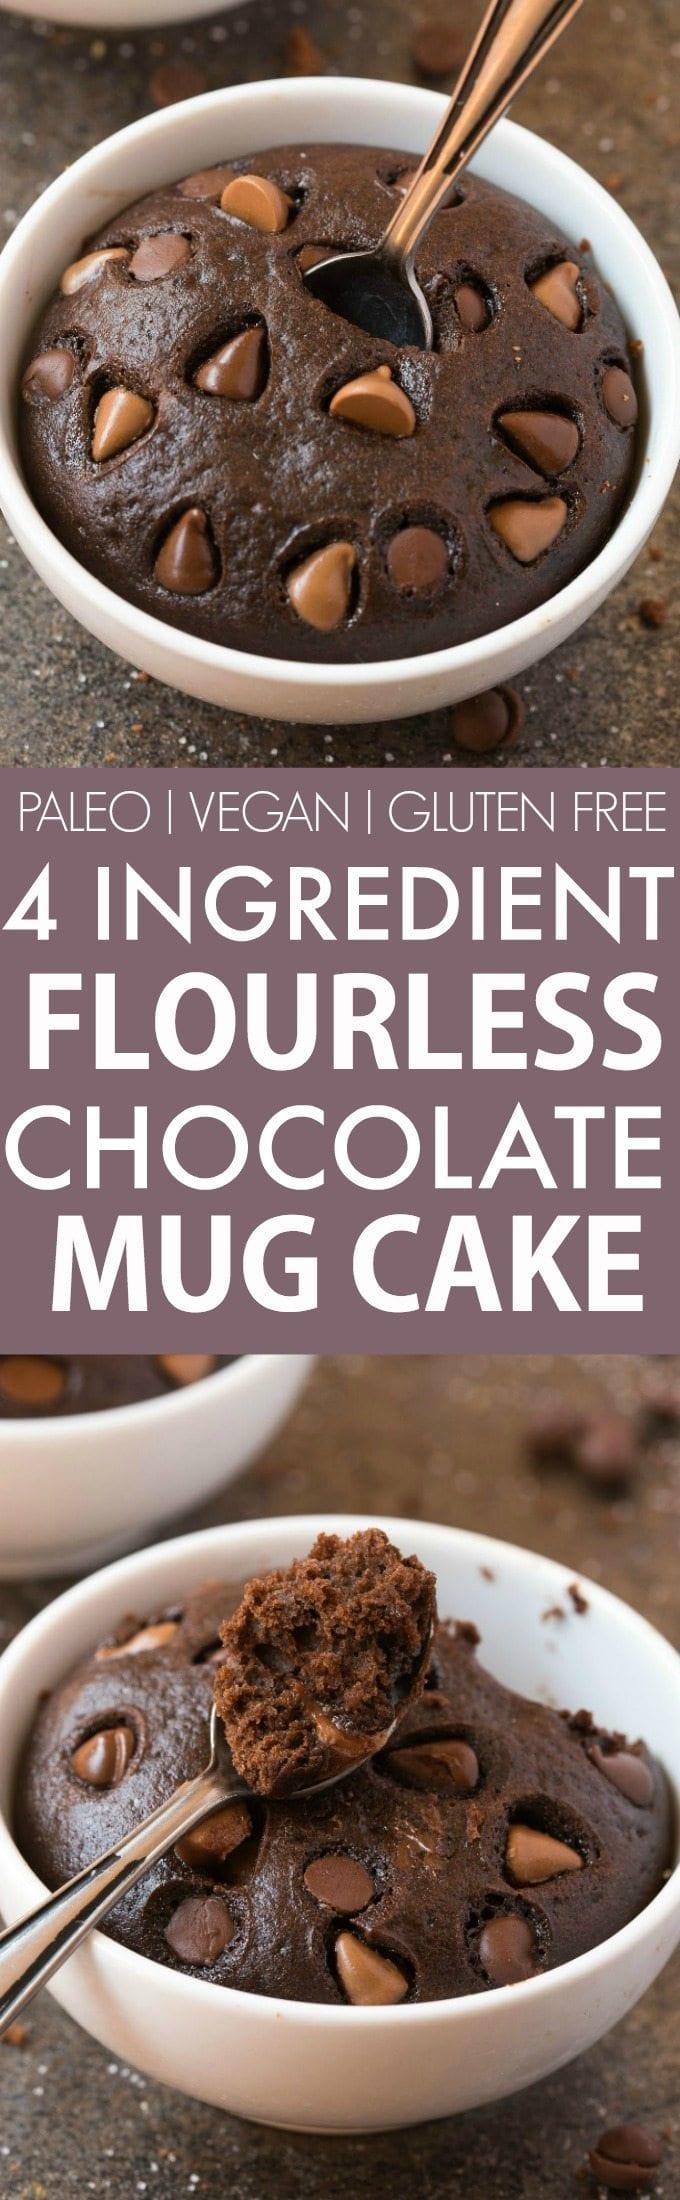 Healthy 4 Ingredient Flourless Chocolate Mug Cake (Paleo, Vegan ...